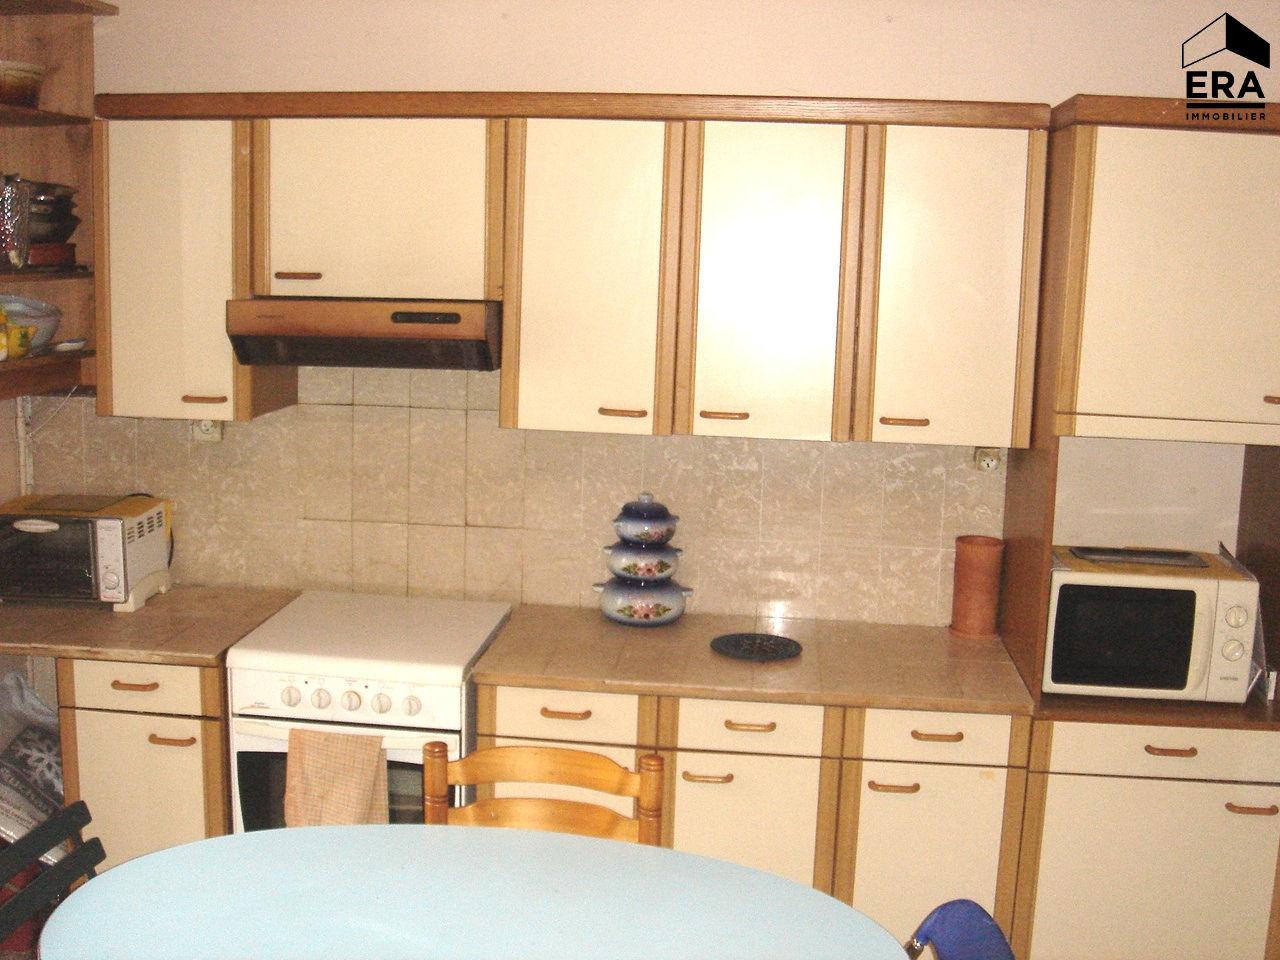 Carrelage Salle De Bain Agde ~ a vendre appartement 50 89 m agde era agence immo de la mairie